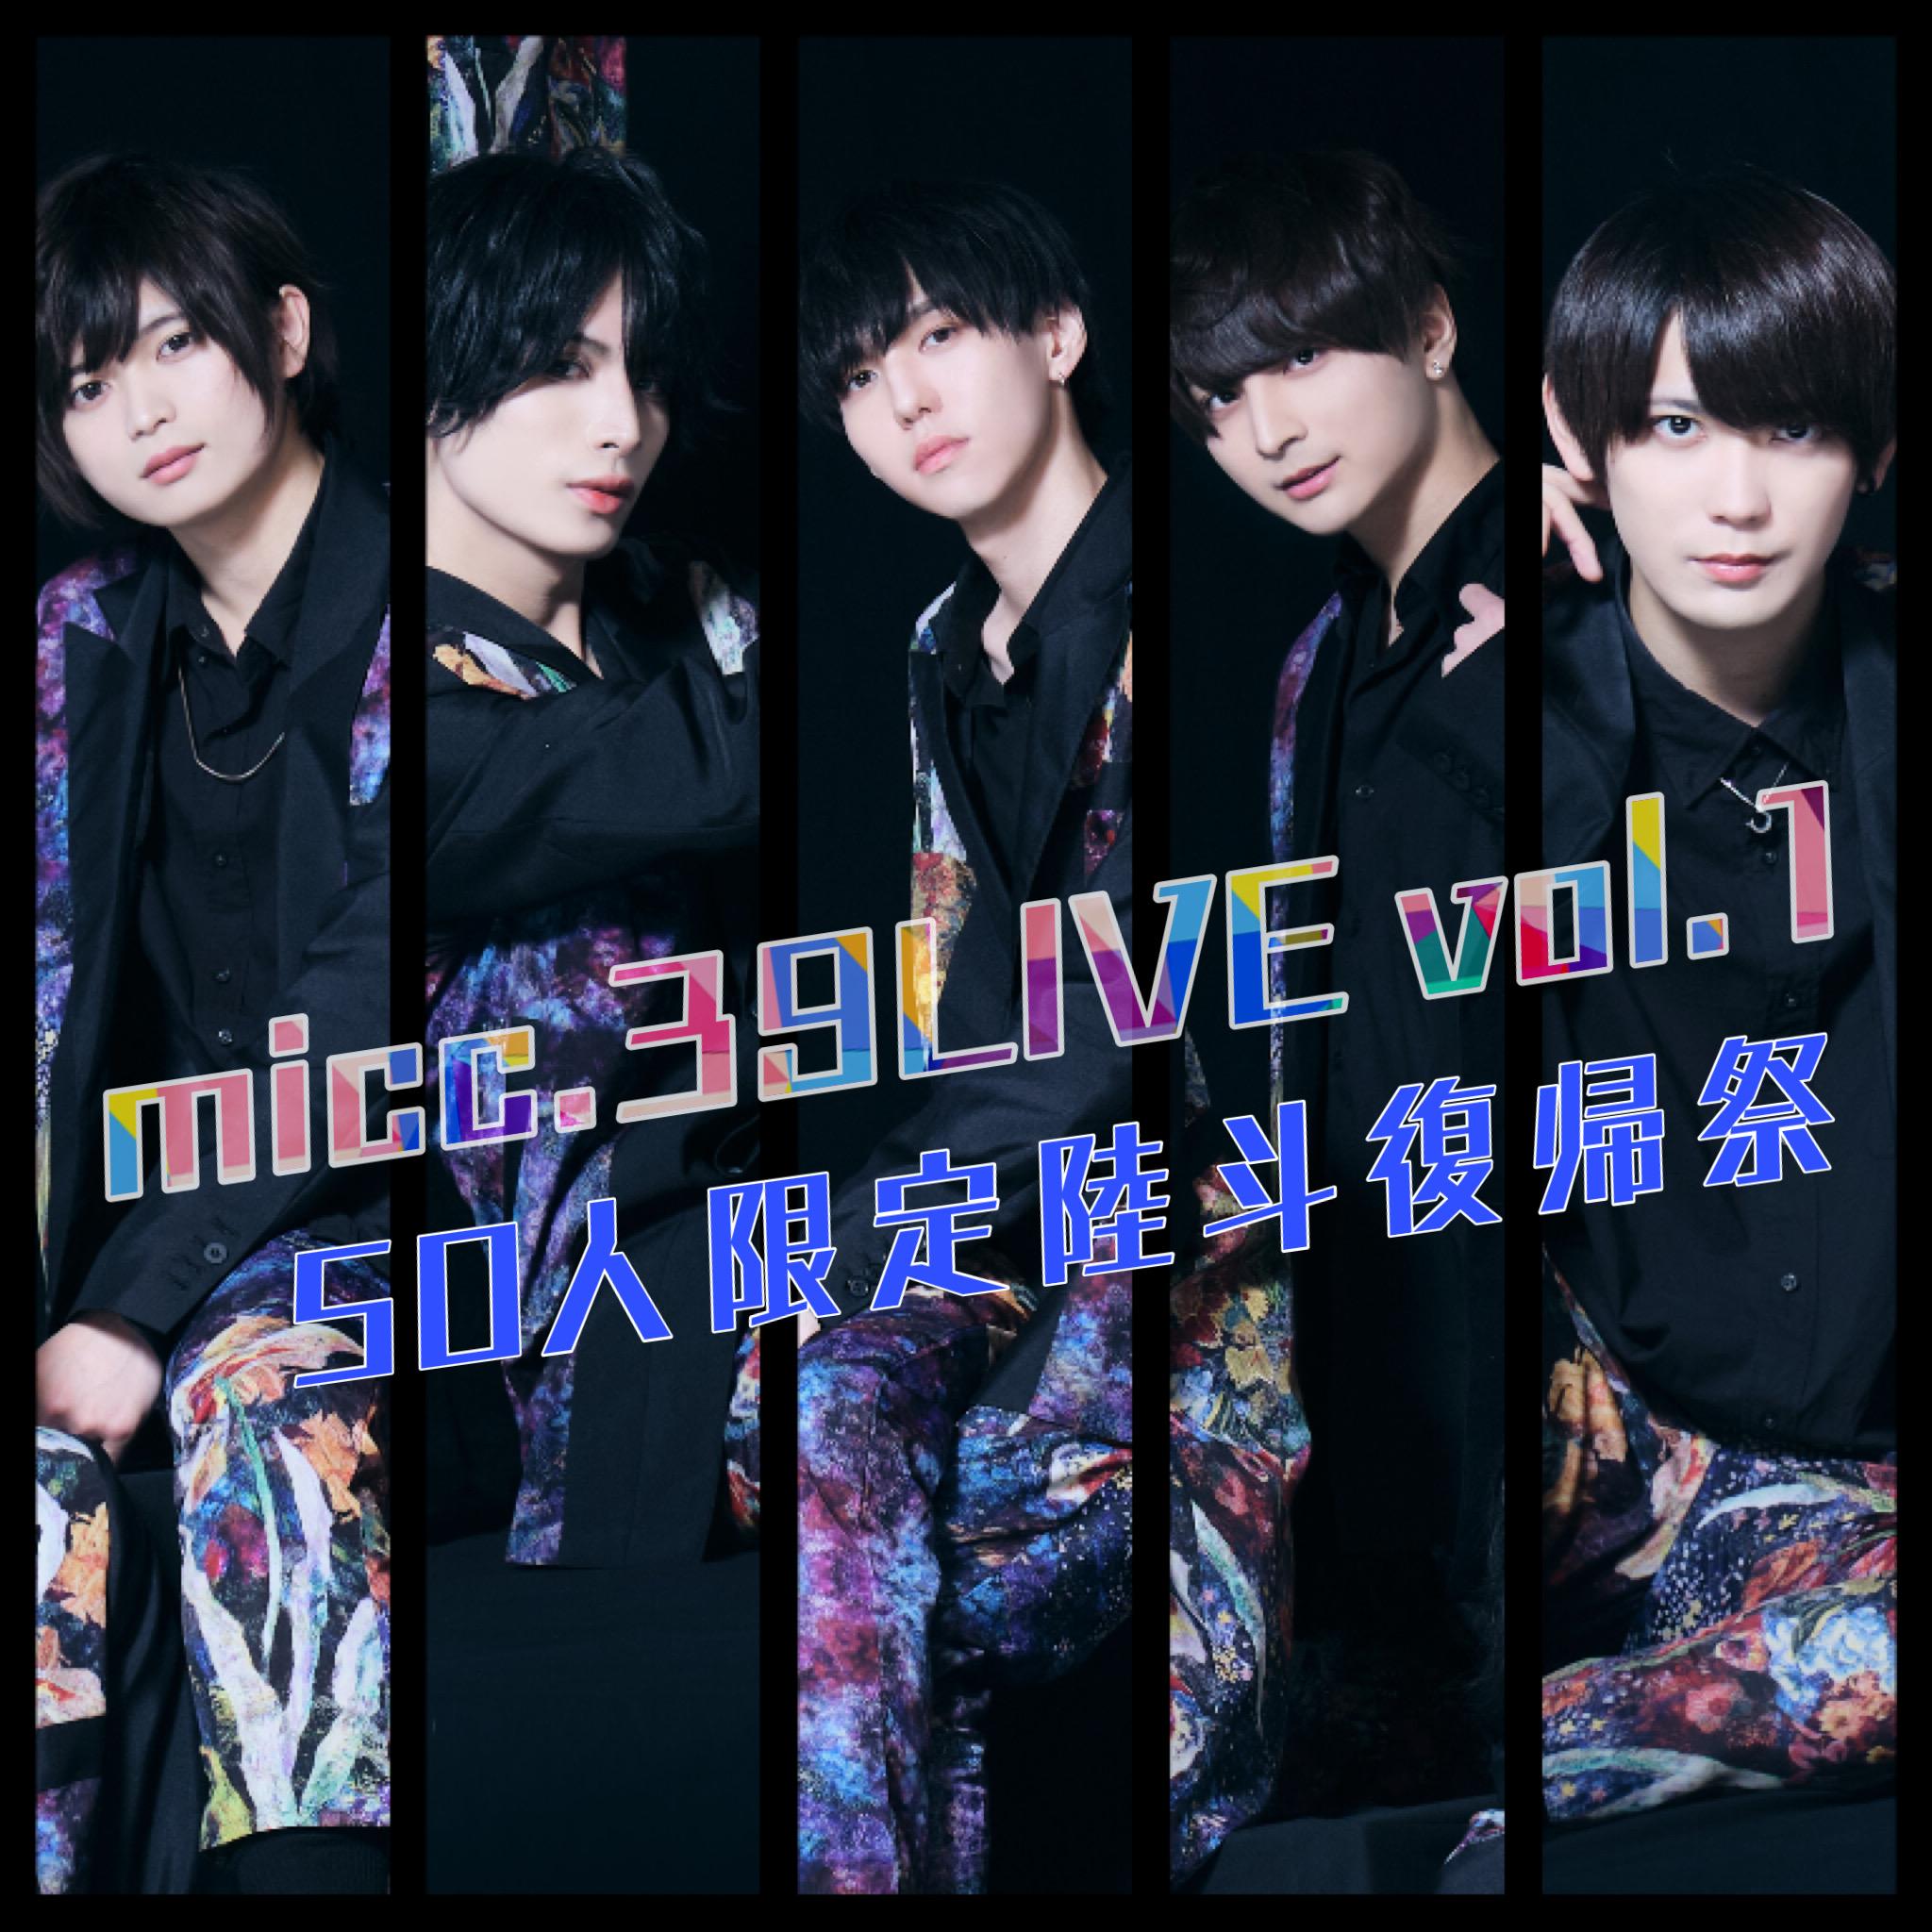 「micc.39LIVE vol.1 50人限定陸斗復帰祭」